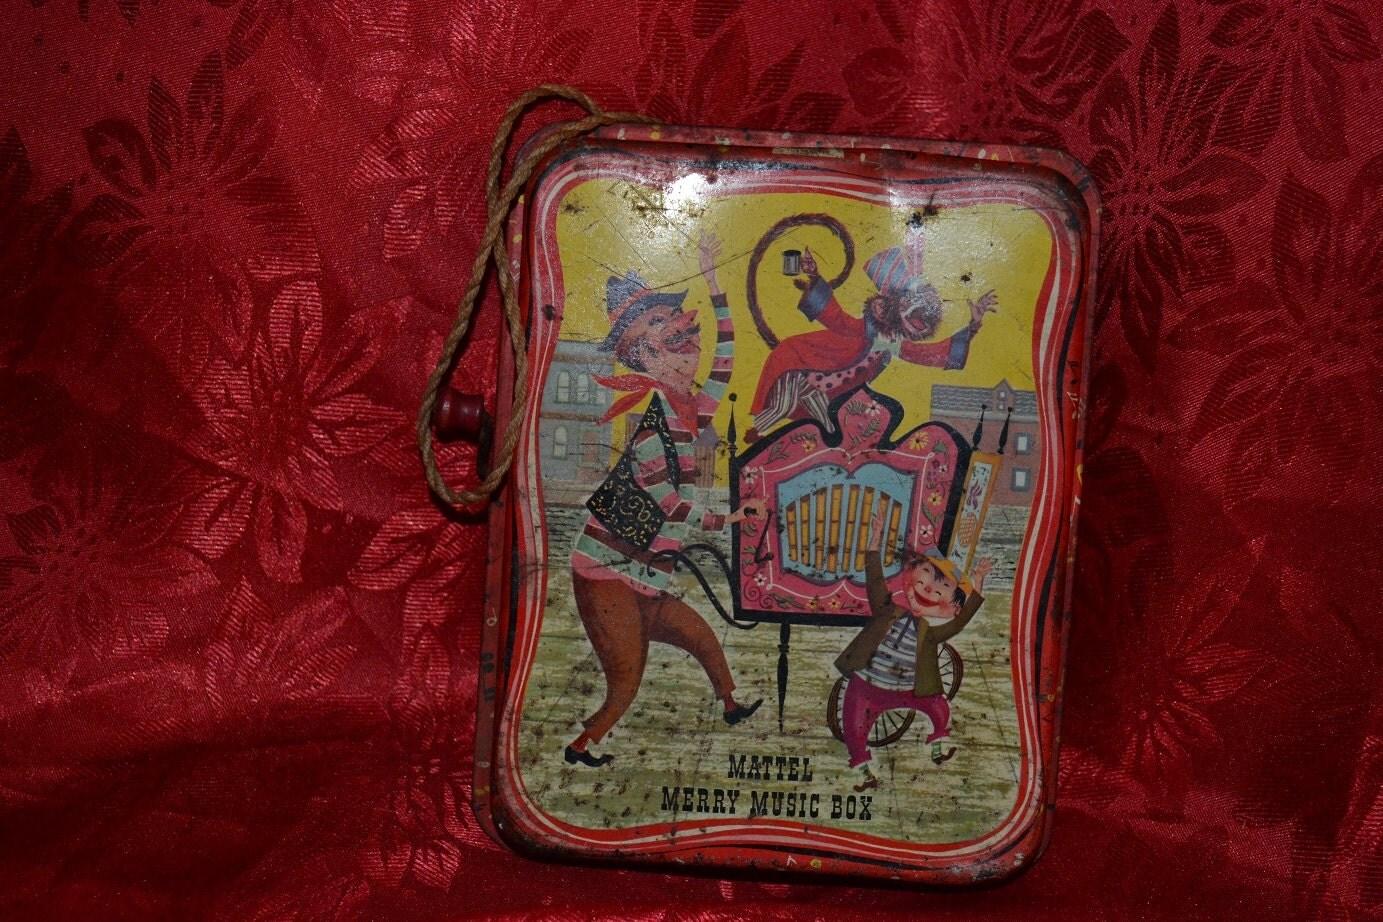 Old Mattel Toys : Vintage mattel merry music box tin toy